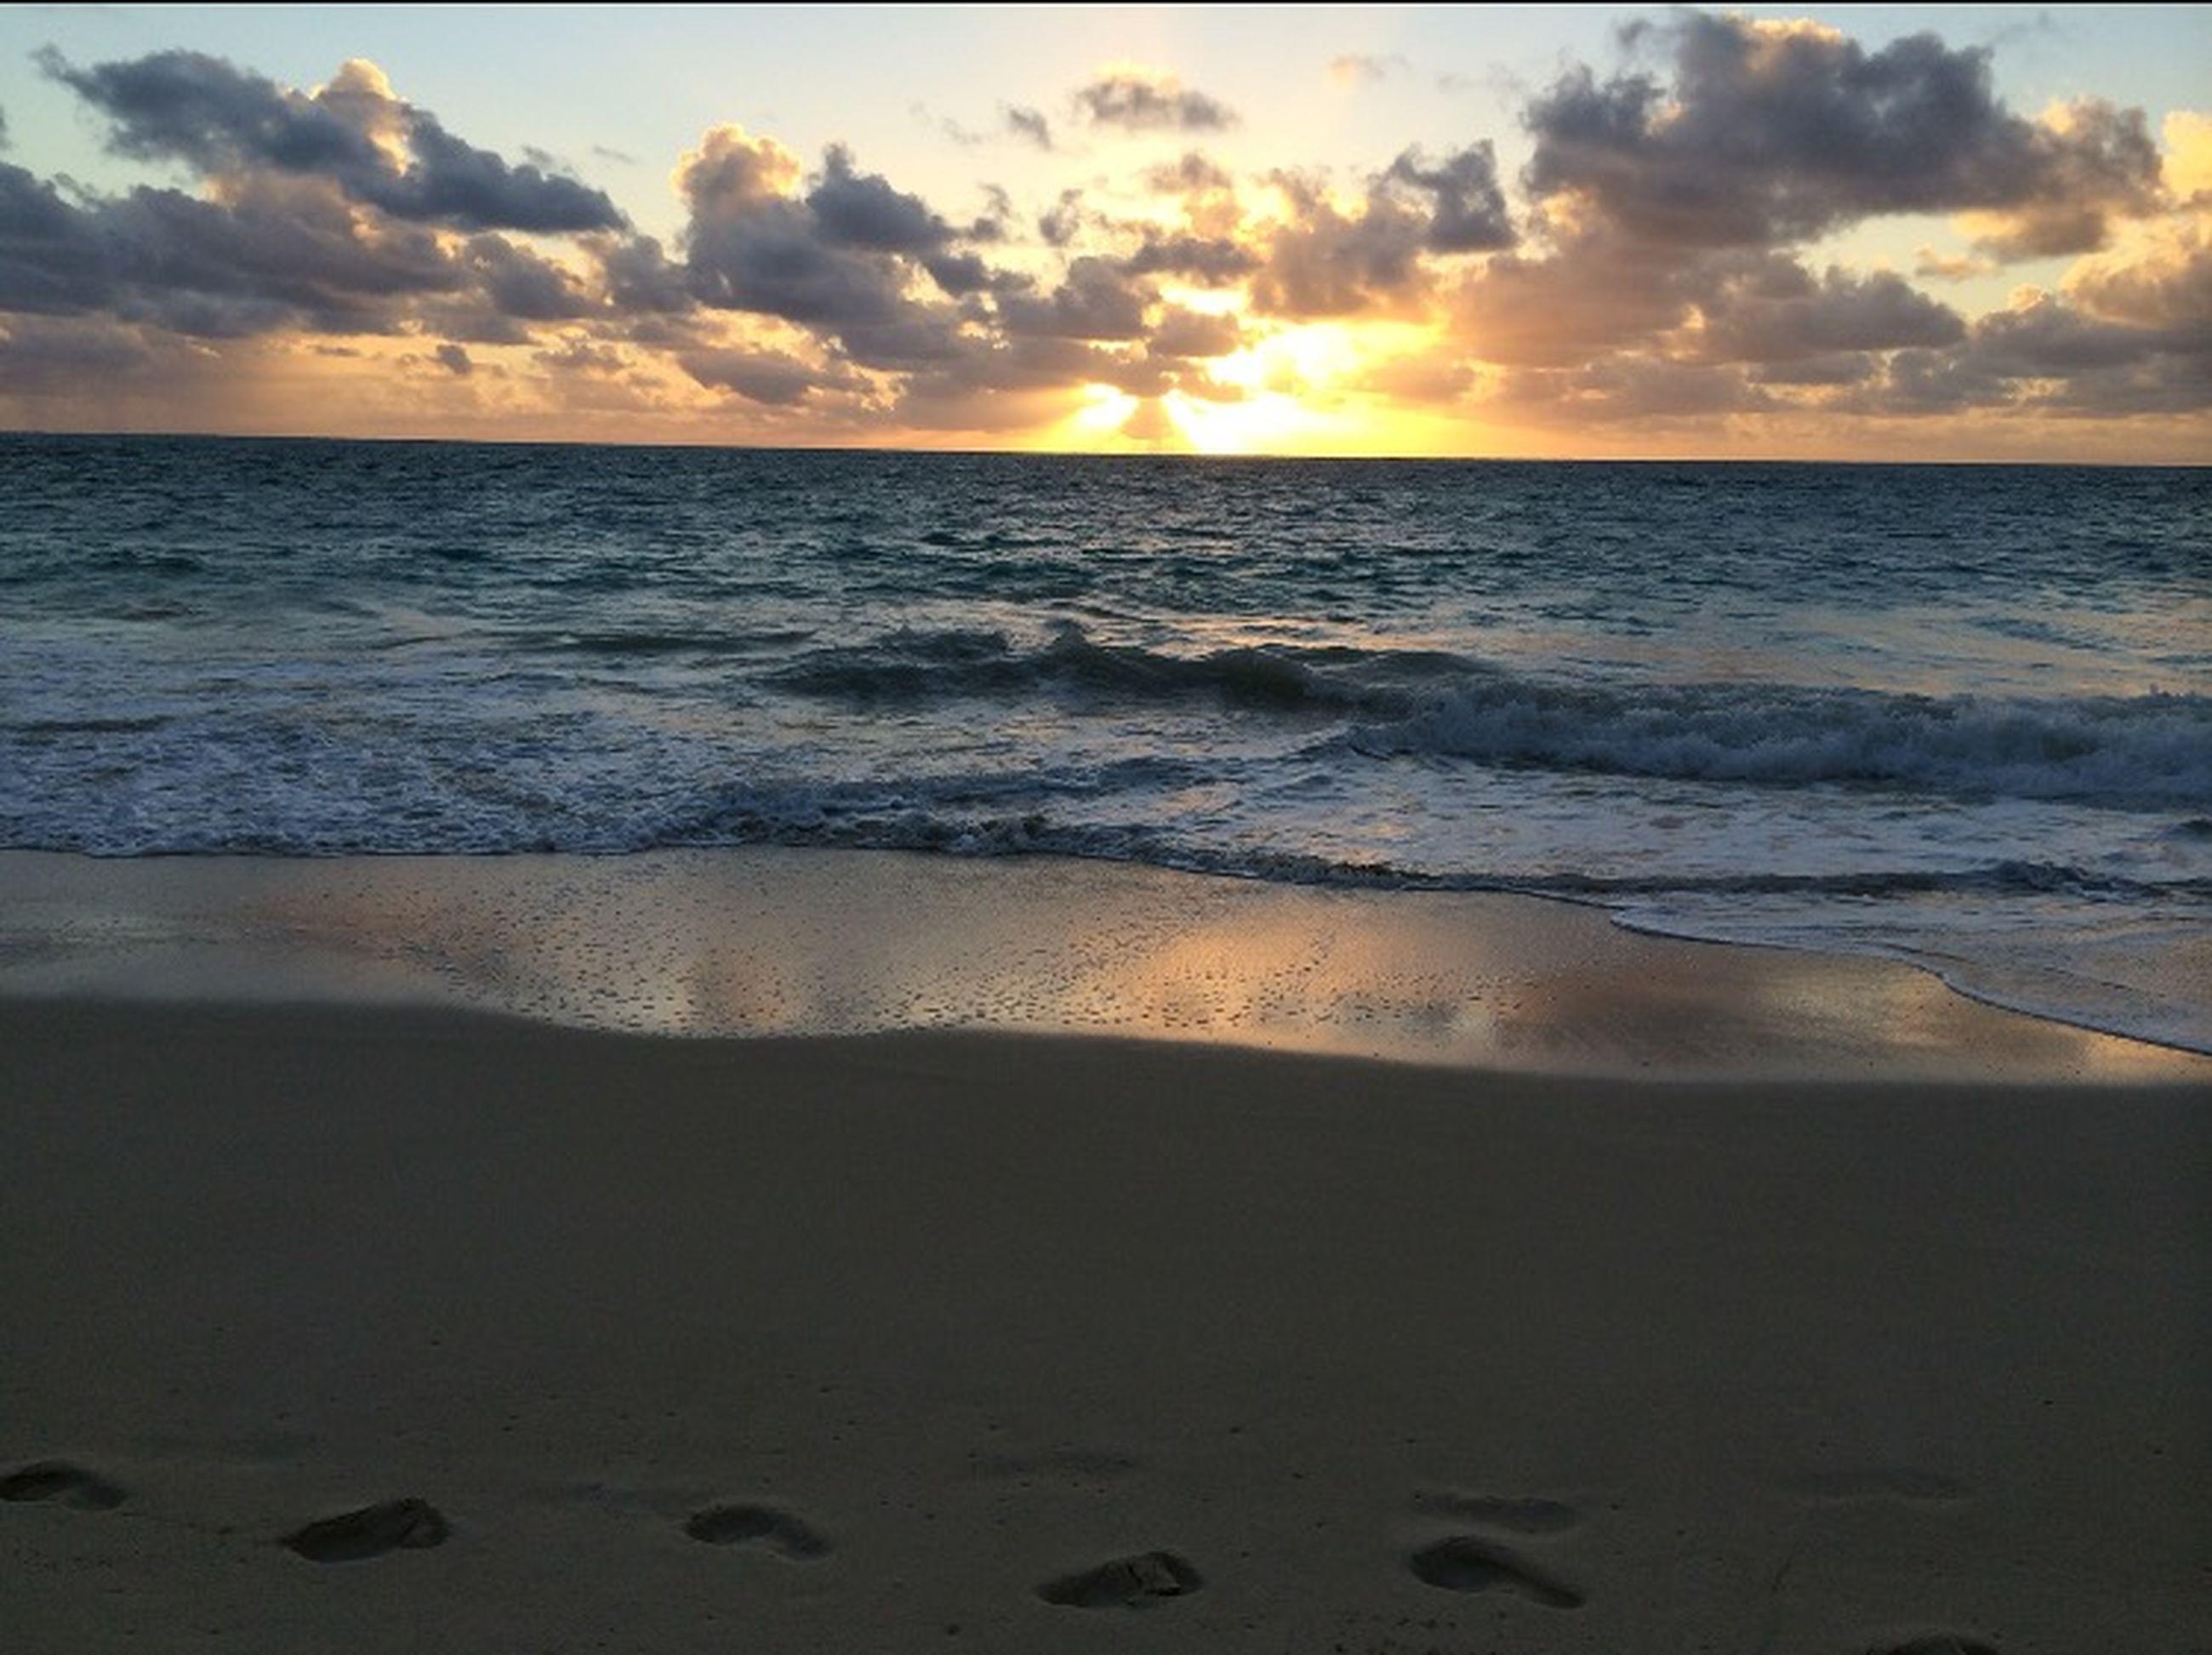 sea, horizon over water, beach, water, shore, scenics, sunset, sky, beauty in nature, tranquil scene, tranquility, wave, sand, idyllic, nature, cloud - sky, surf, cloud, seascape, coastline